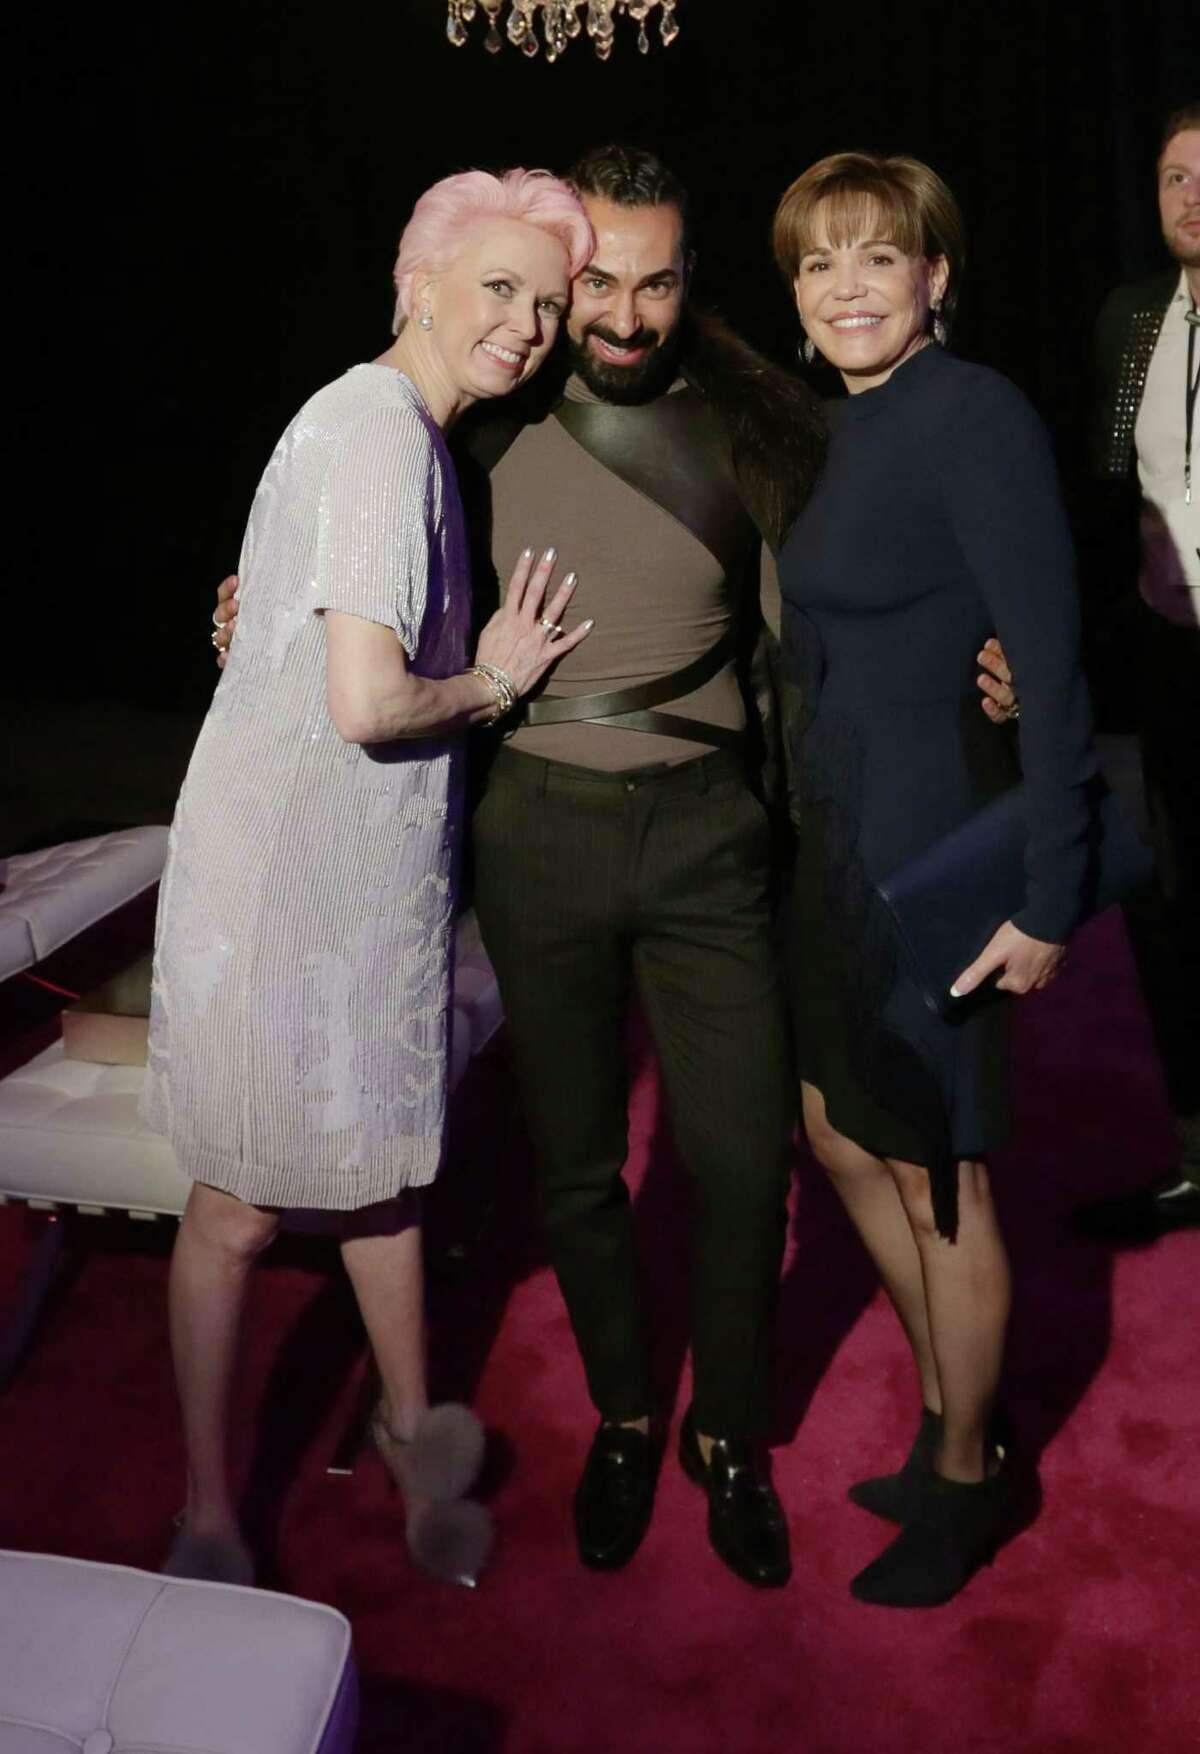 Vivian Wise, Fady Armanious and Hallie Vanderhider